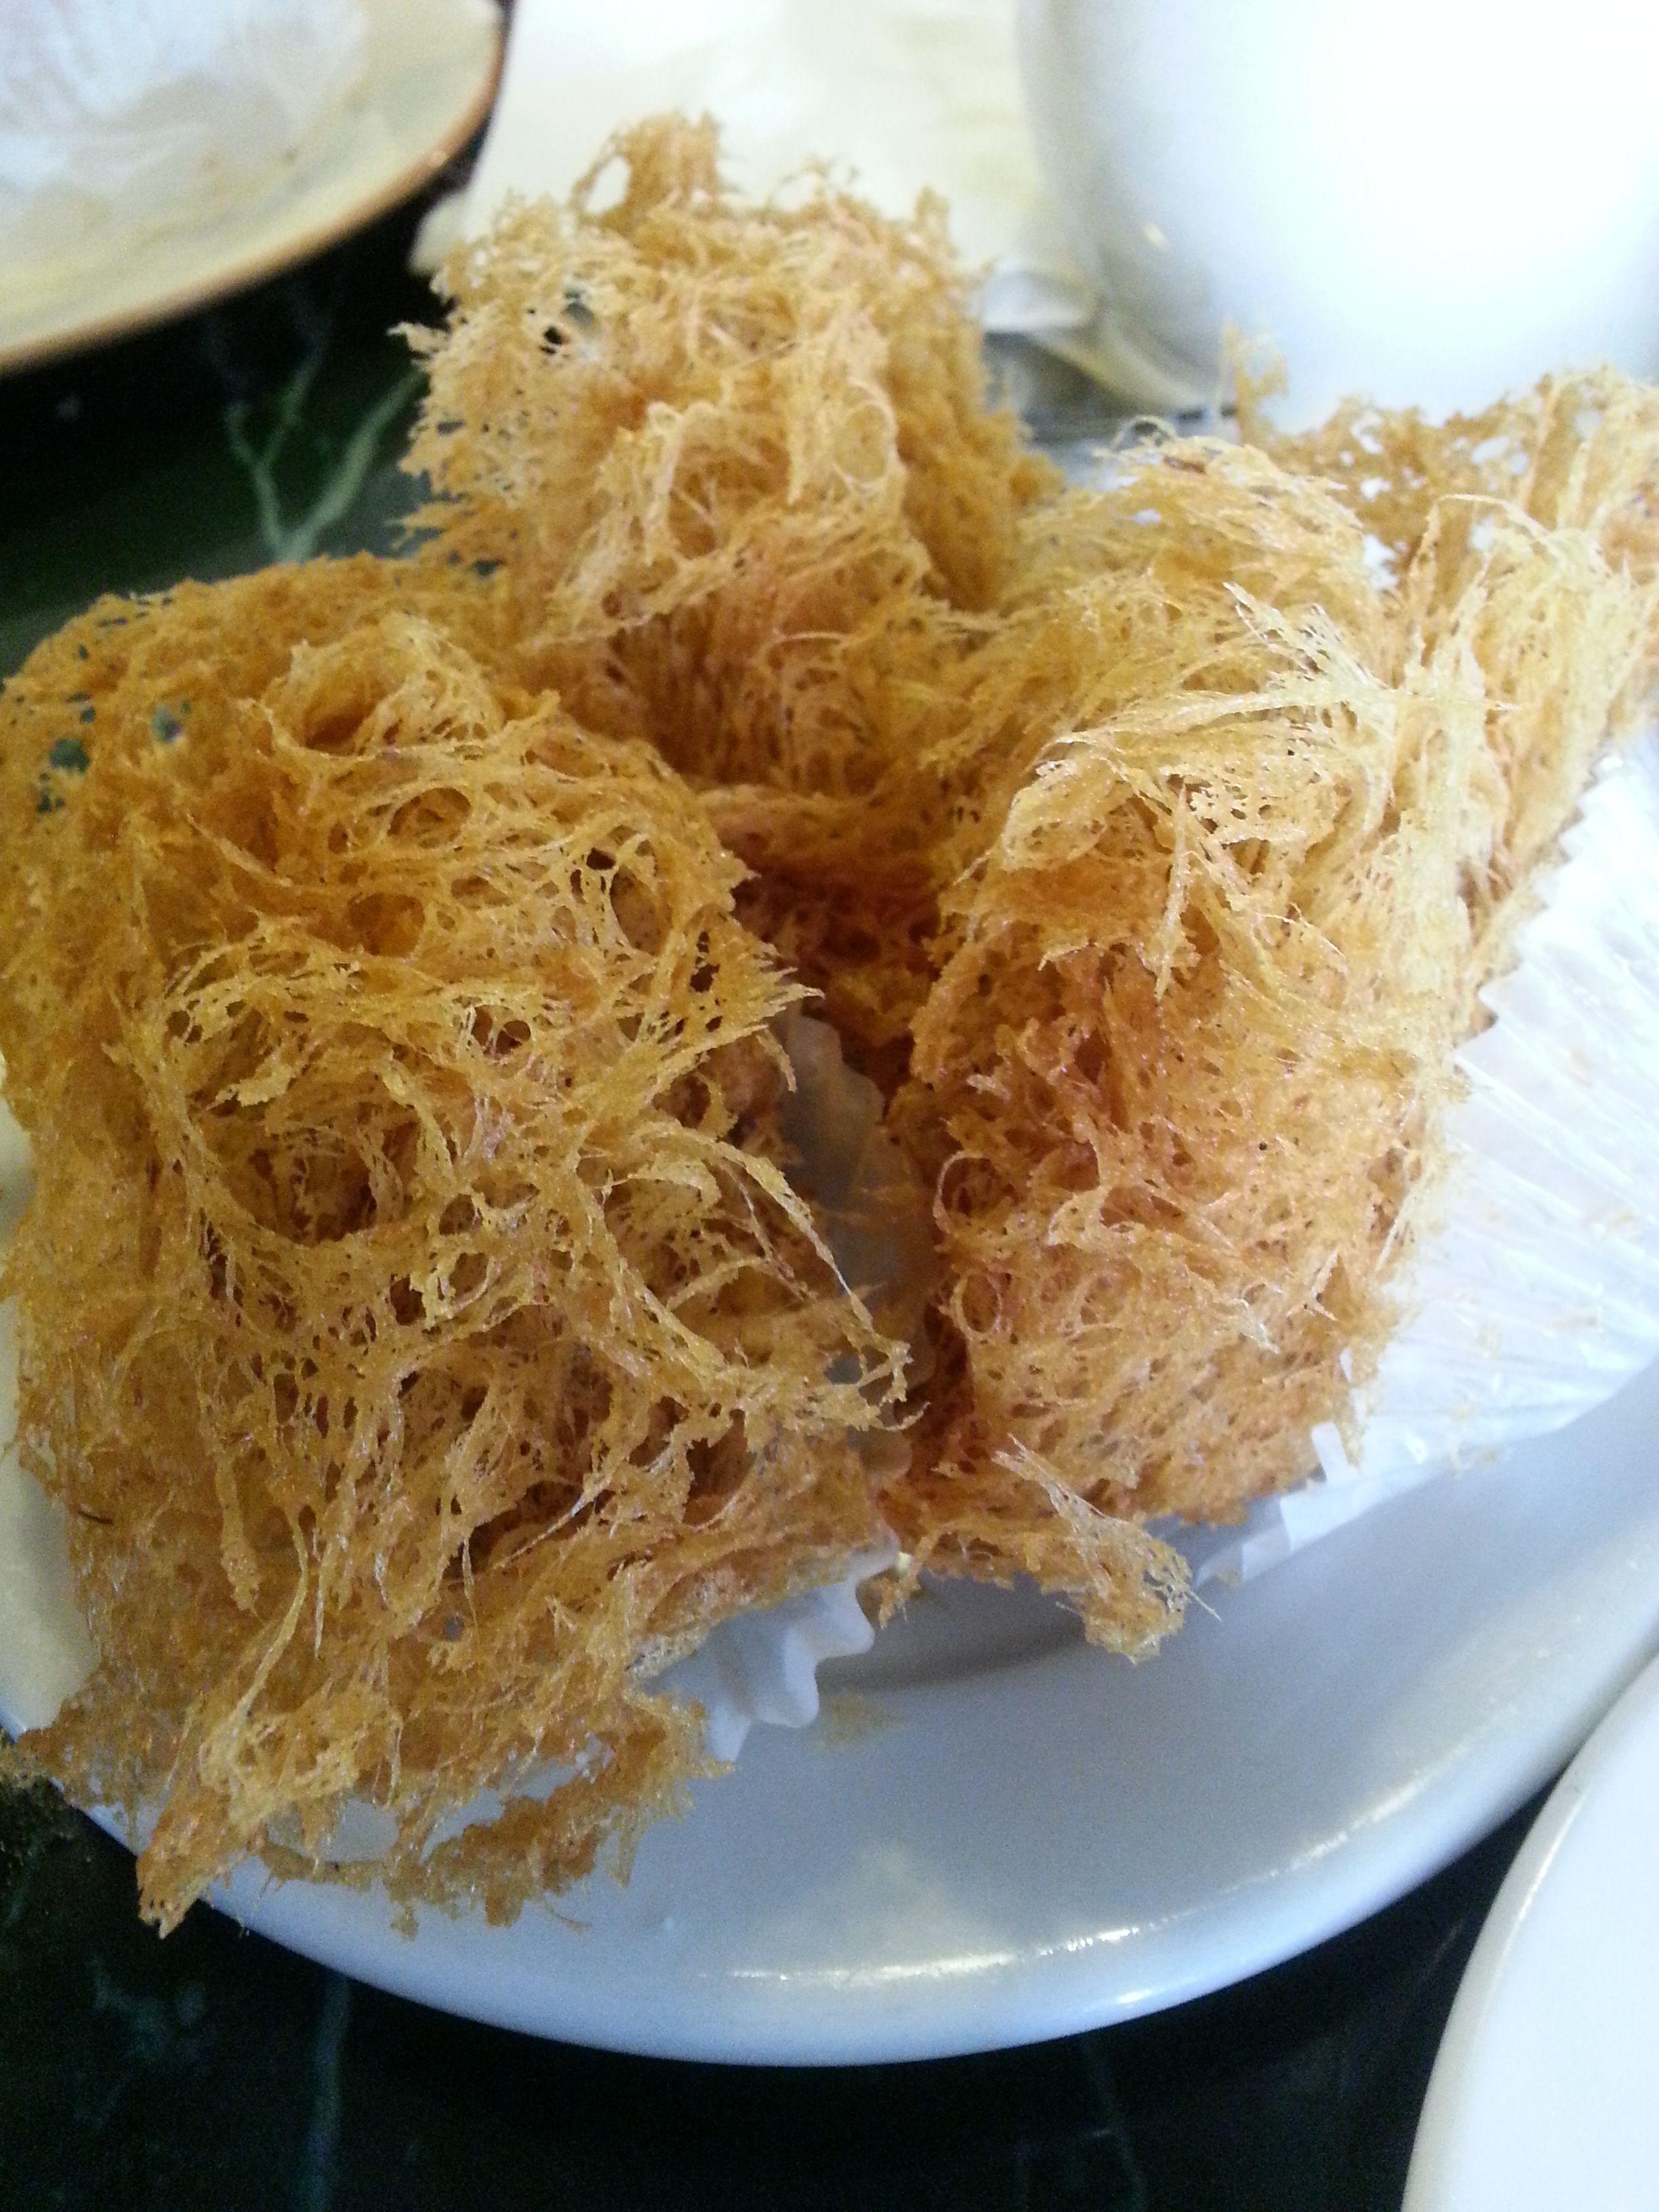 Fried taro food dim sum eat